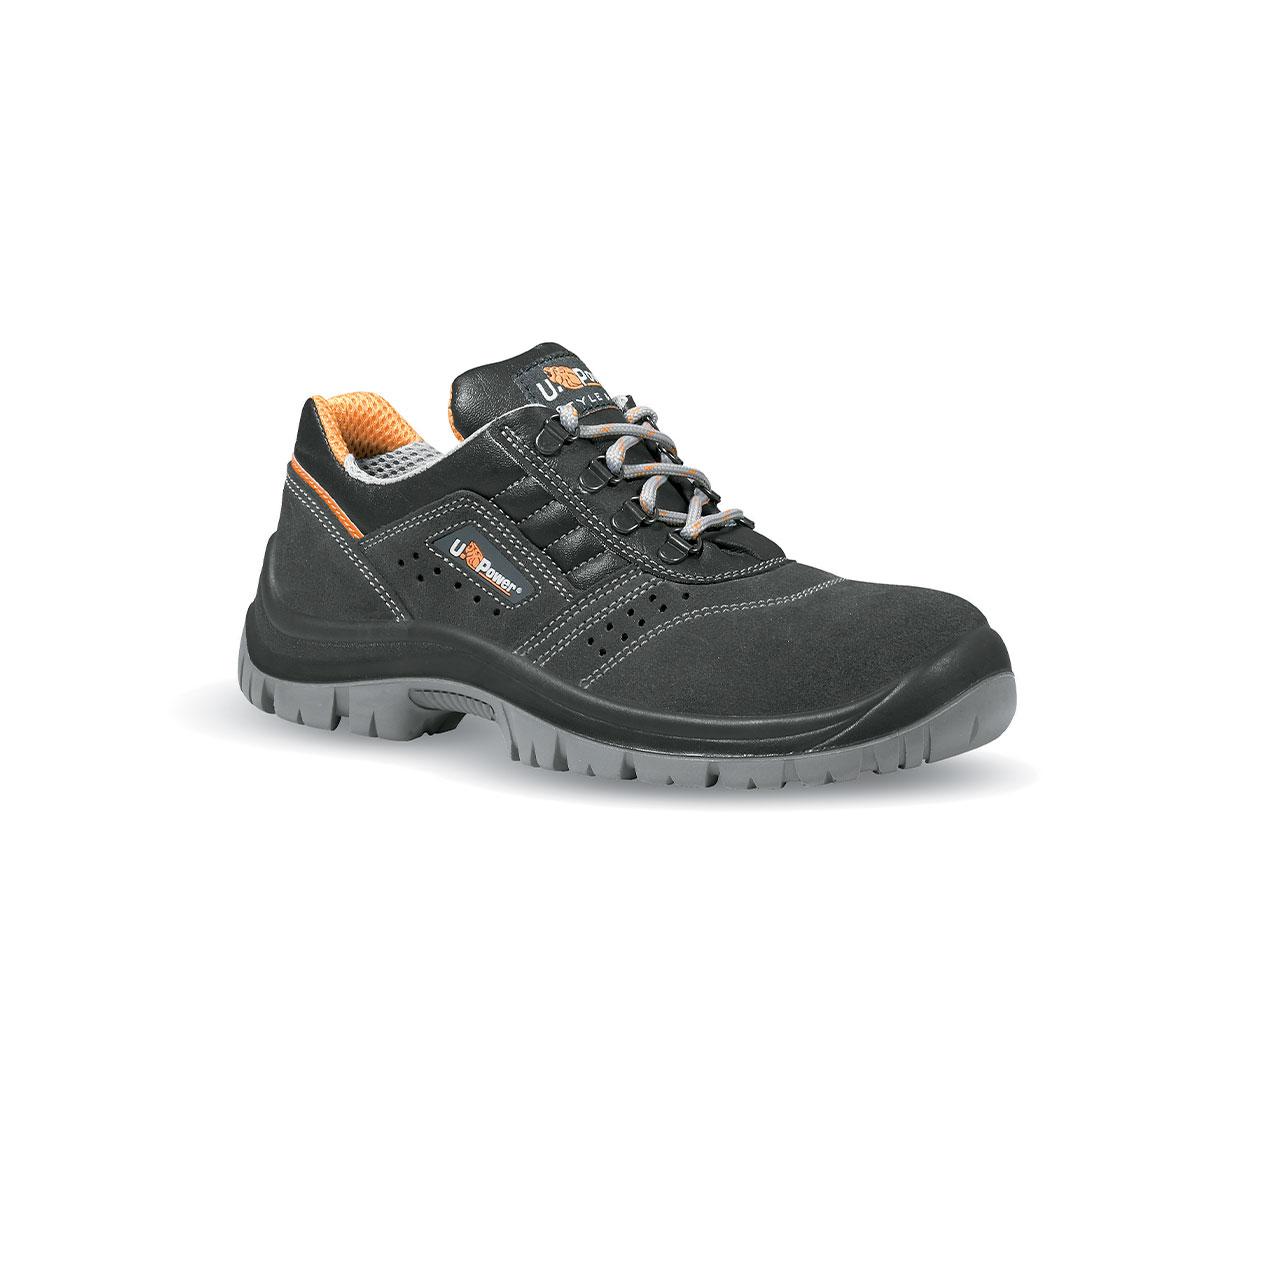 scarpa antinfortunistica upower modello rotational linea STYLE&JOB vista laterale